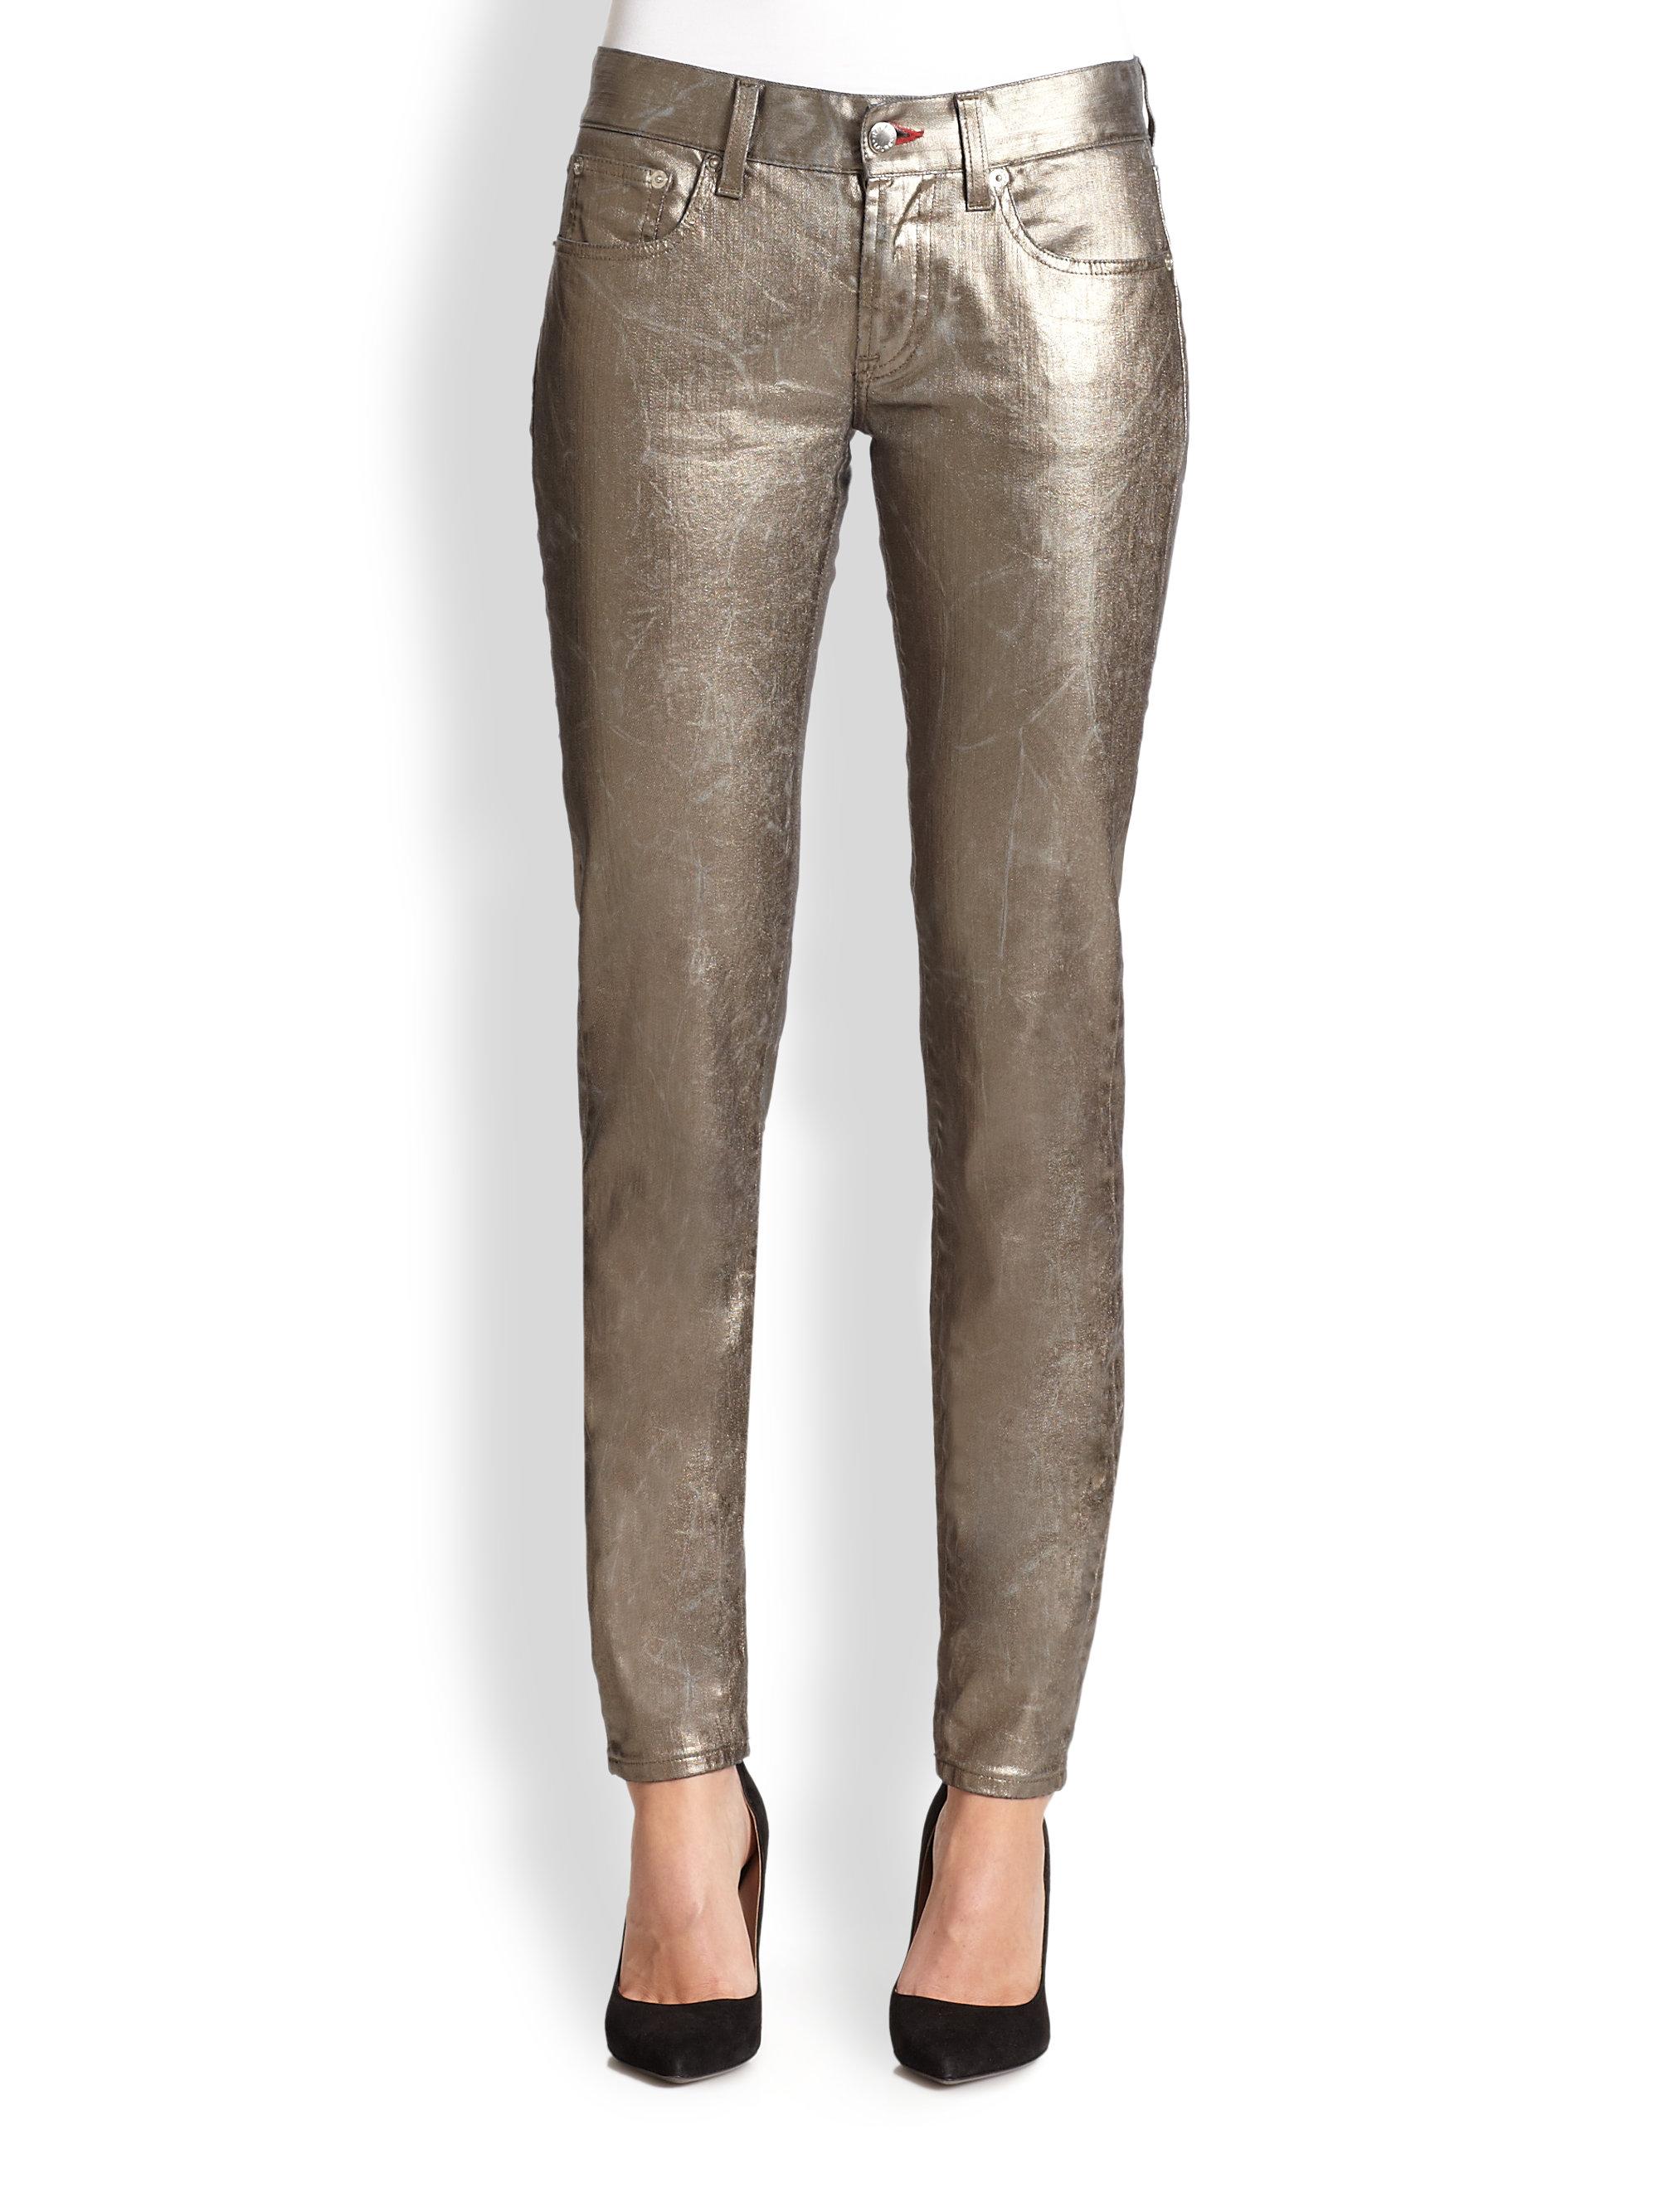 Ralph Lauren Black Label Metallic Matchstick Jeans Lyst